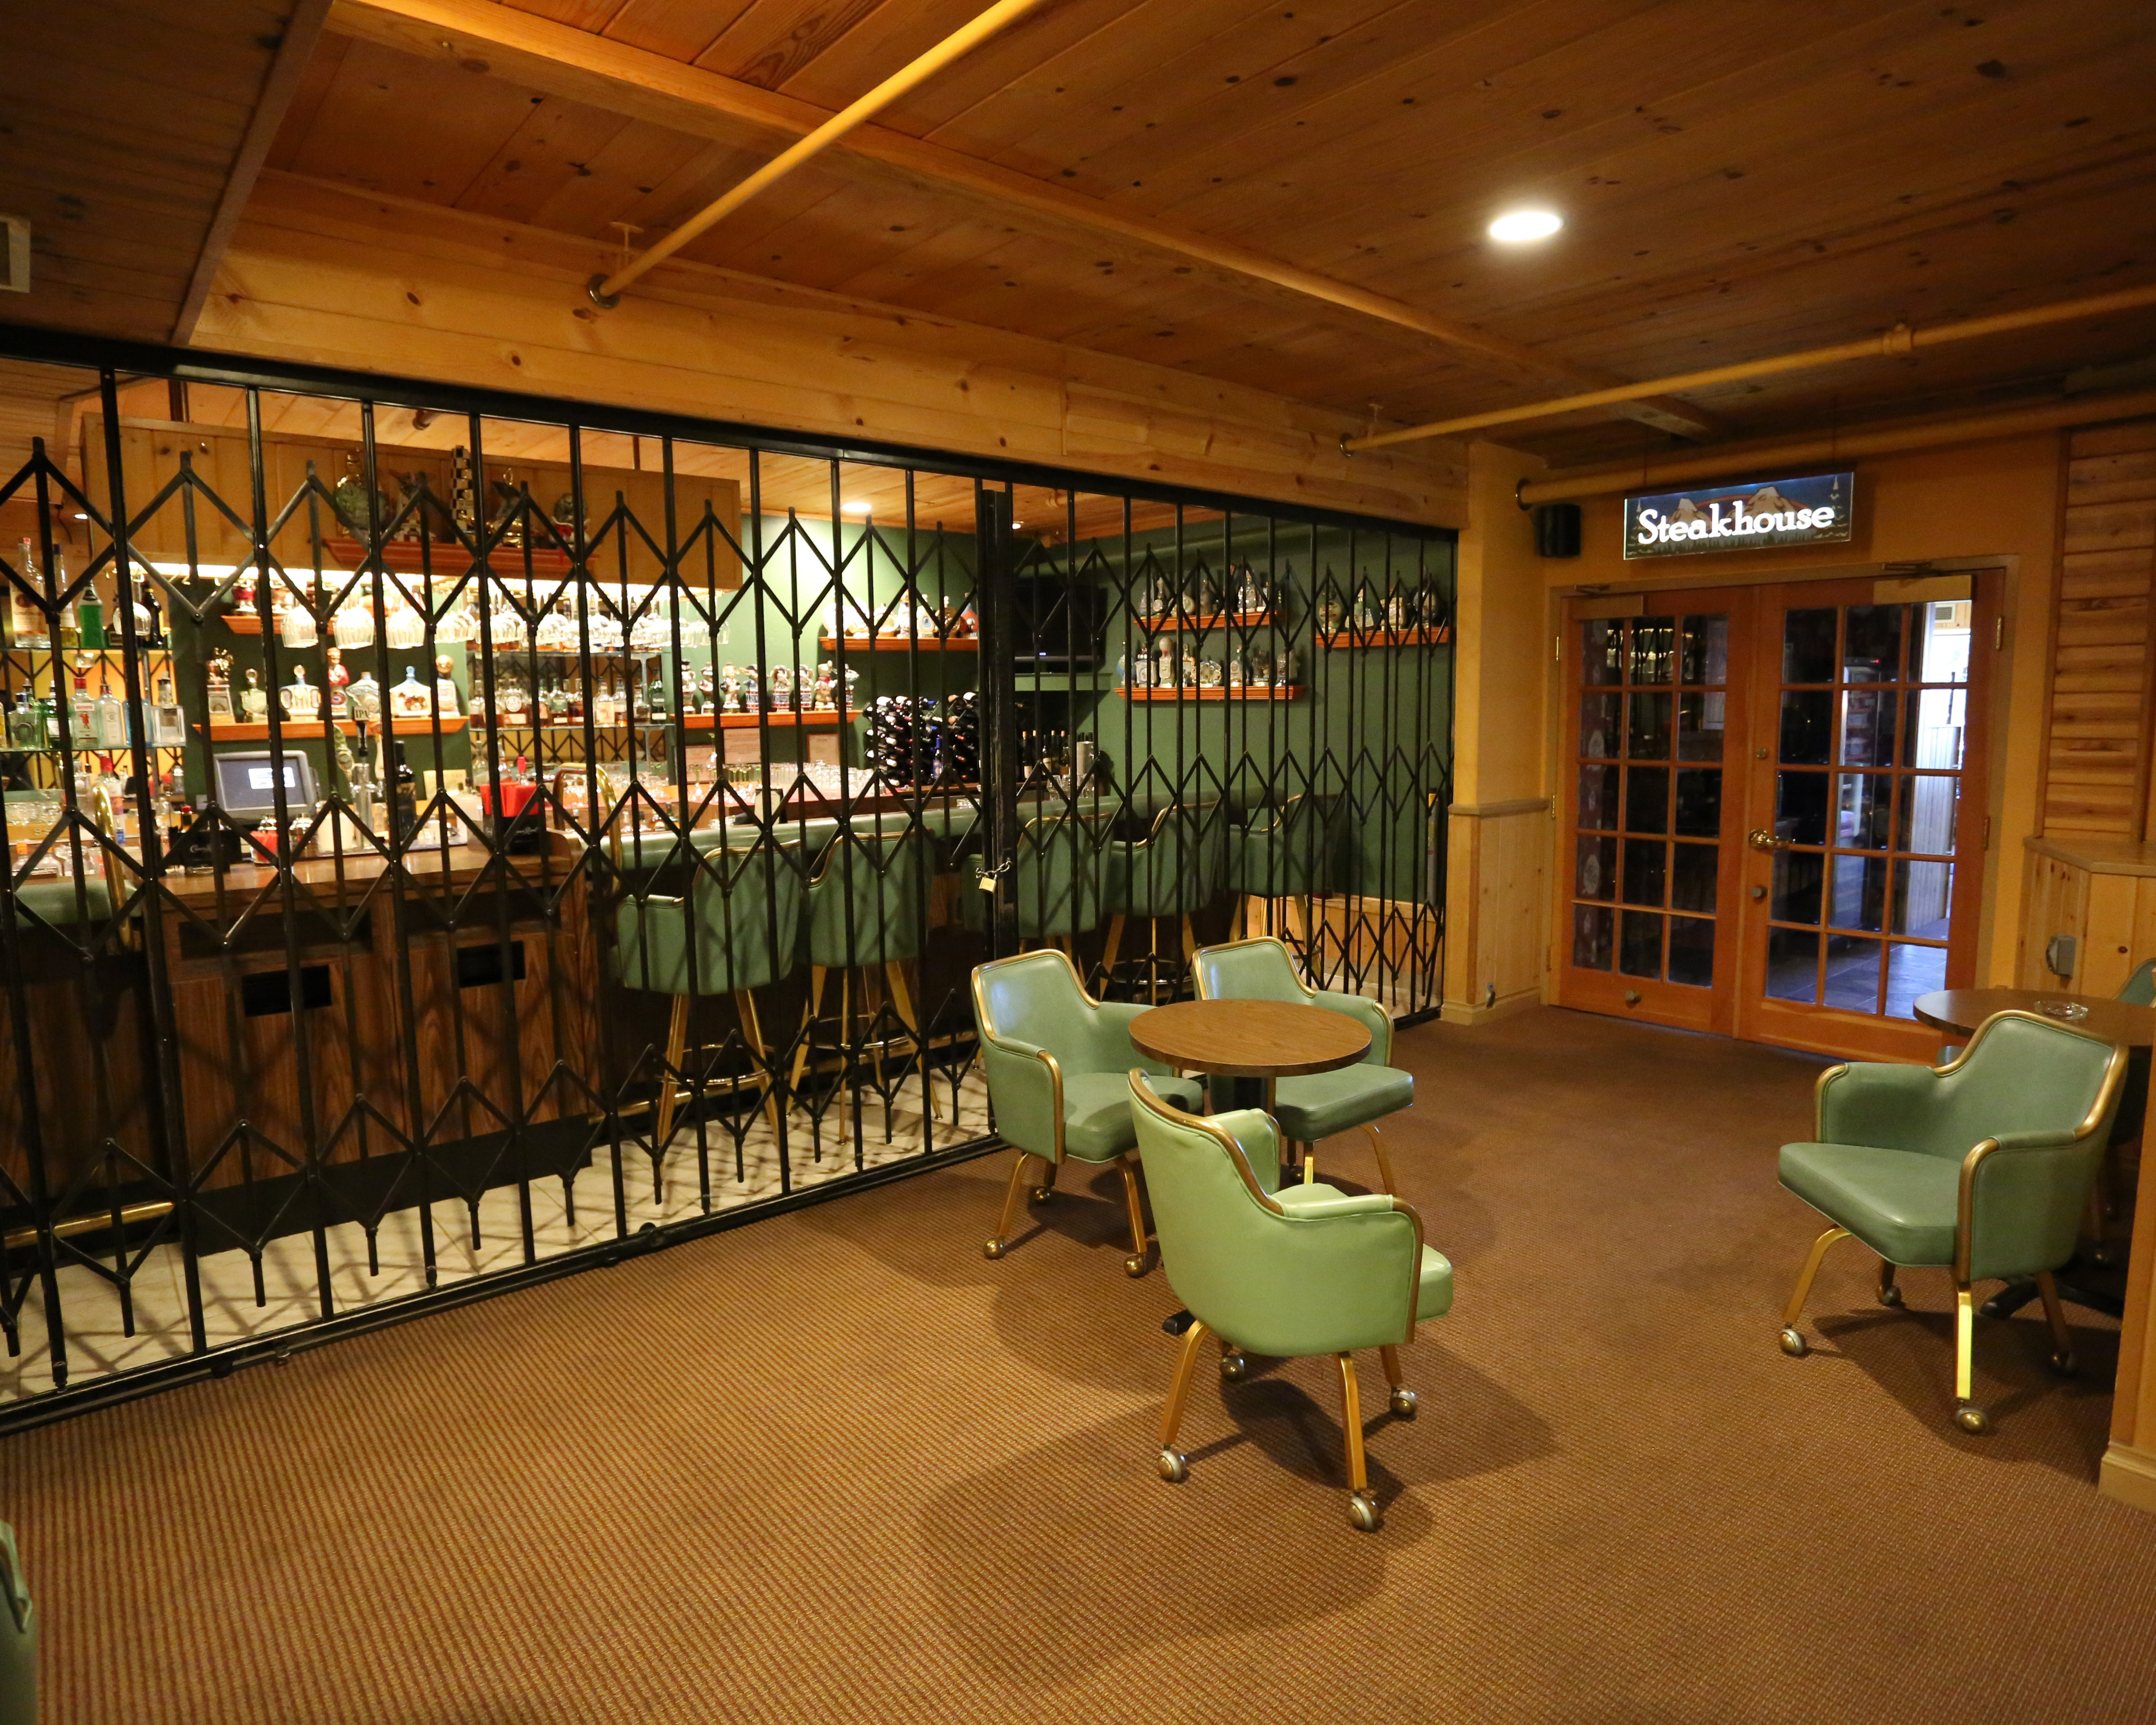 Topaz aparthotel /u0026 casino the raj windmill casino